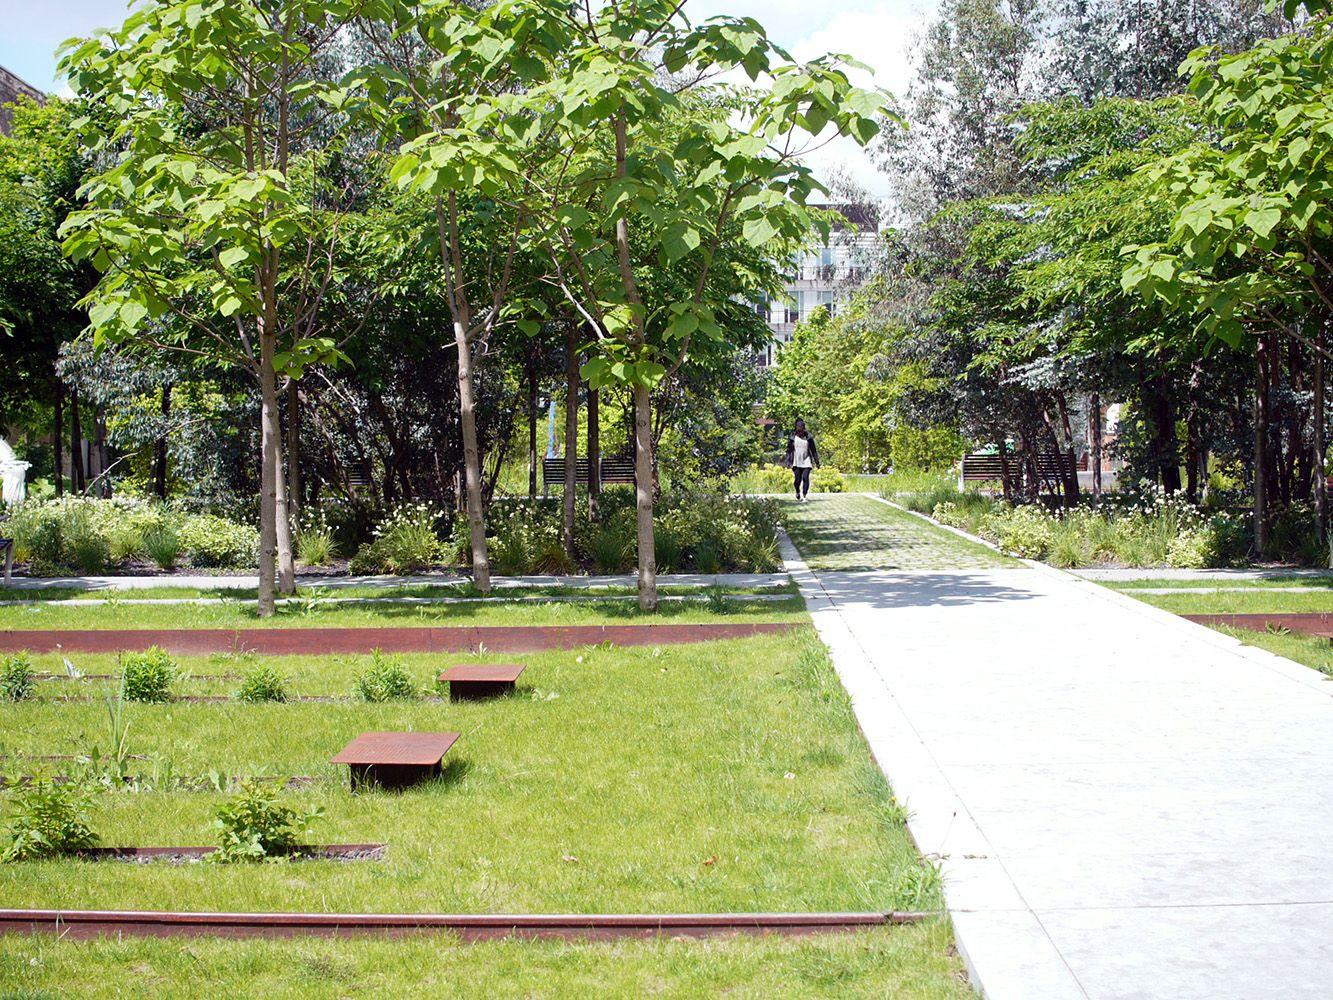 Parc urbain il t 9 ancienne usine bic jardins urbains pinte - Mobilier jardin centrakor colombes ...